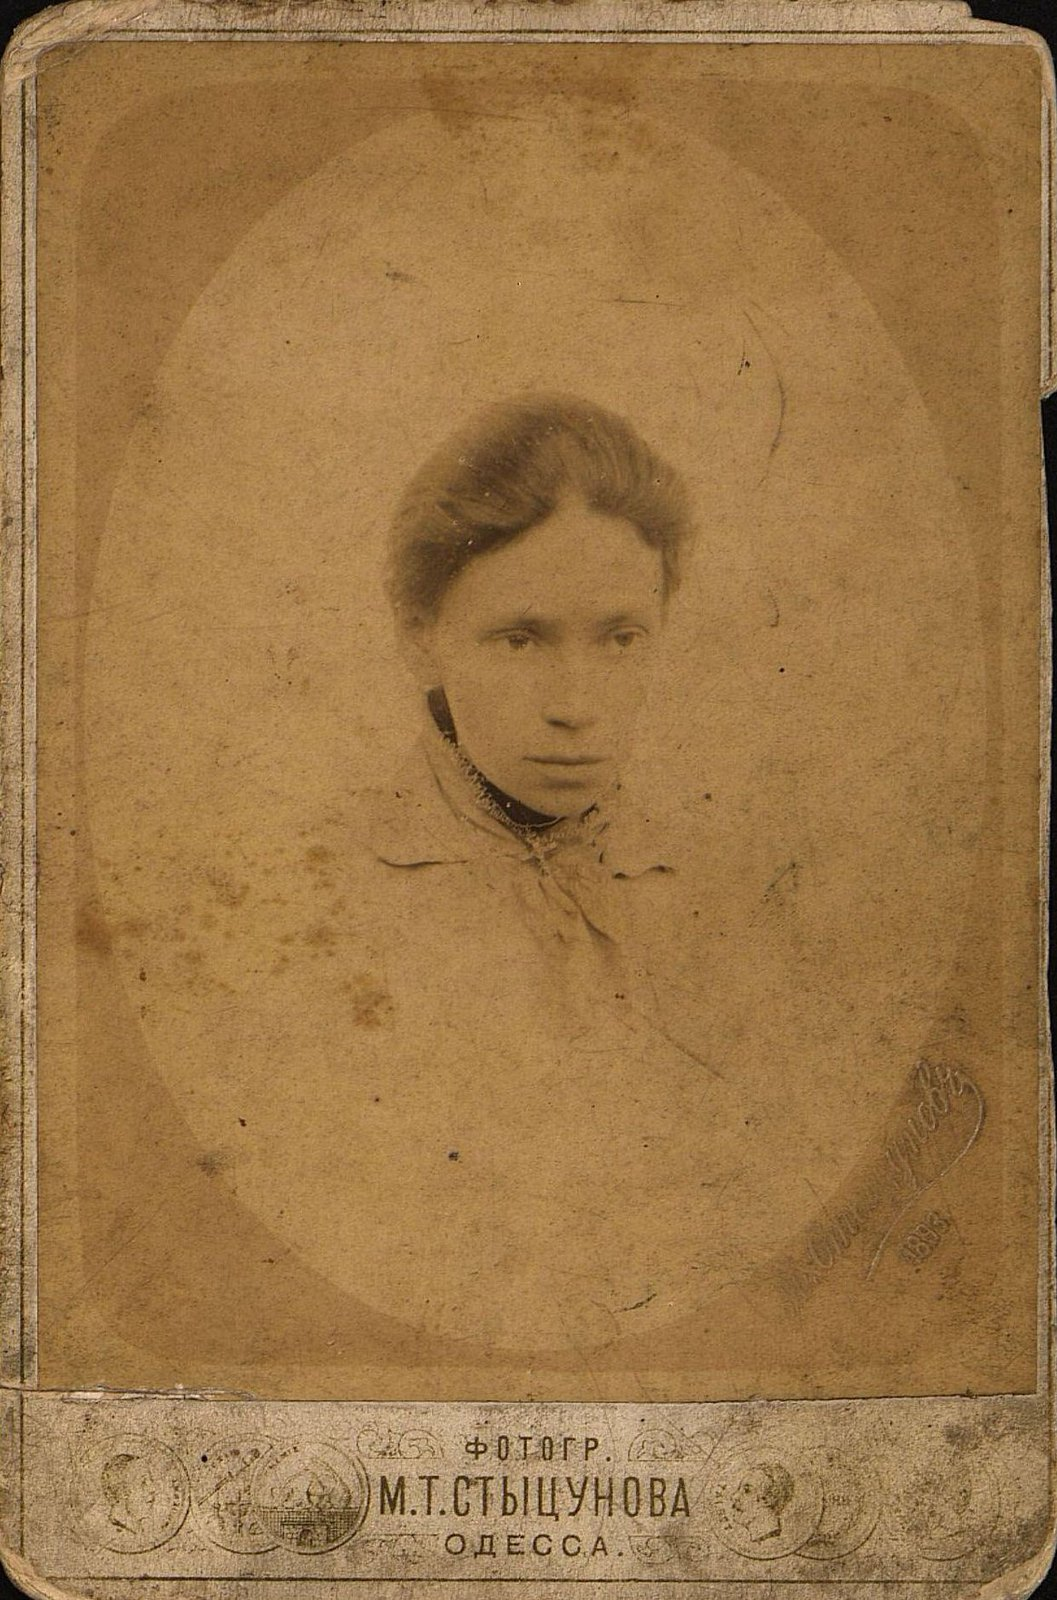 19. Шилюк-Шиленко Анастасия, жена механика РОПиТа.  1893